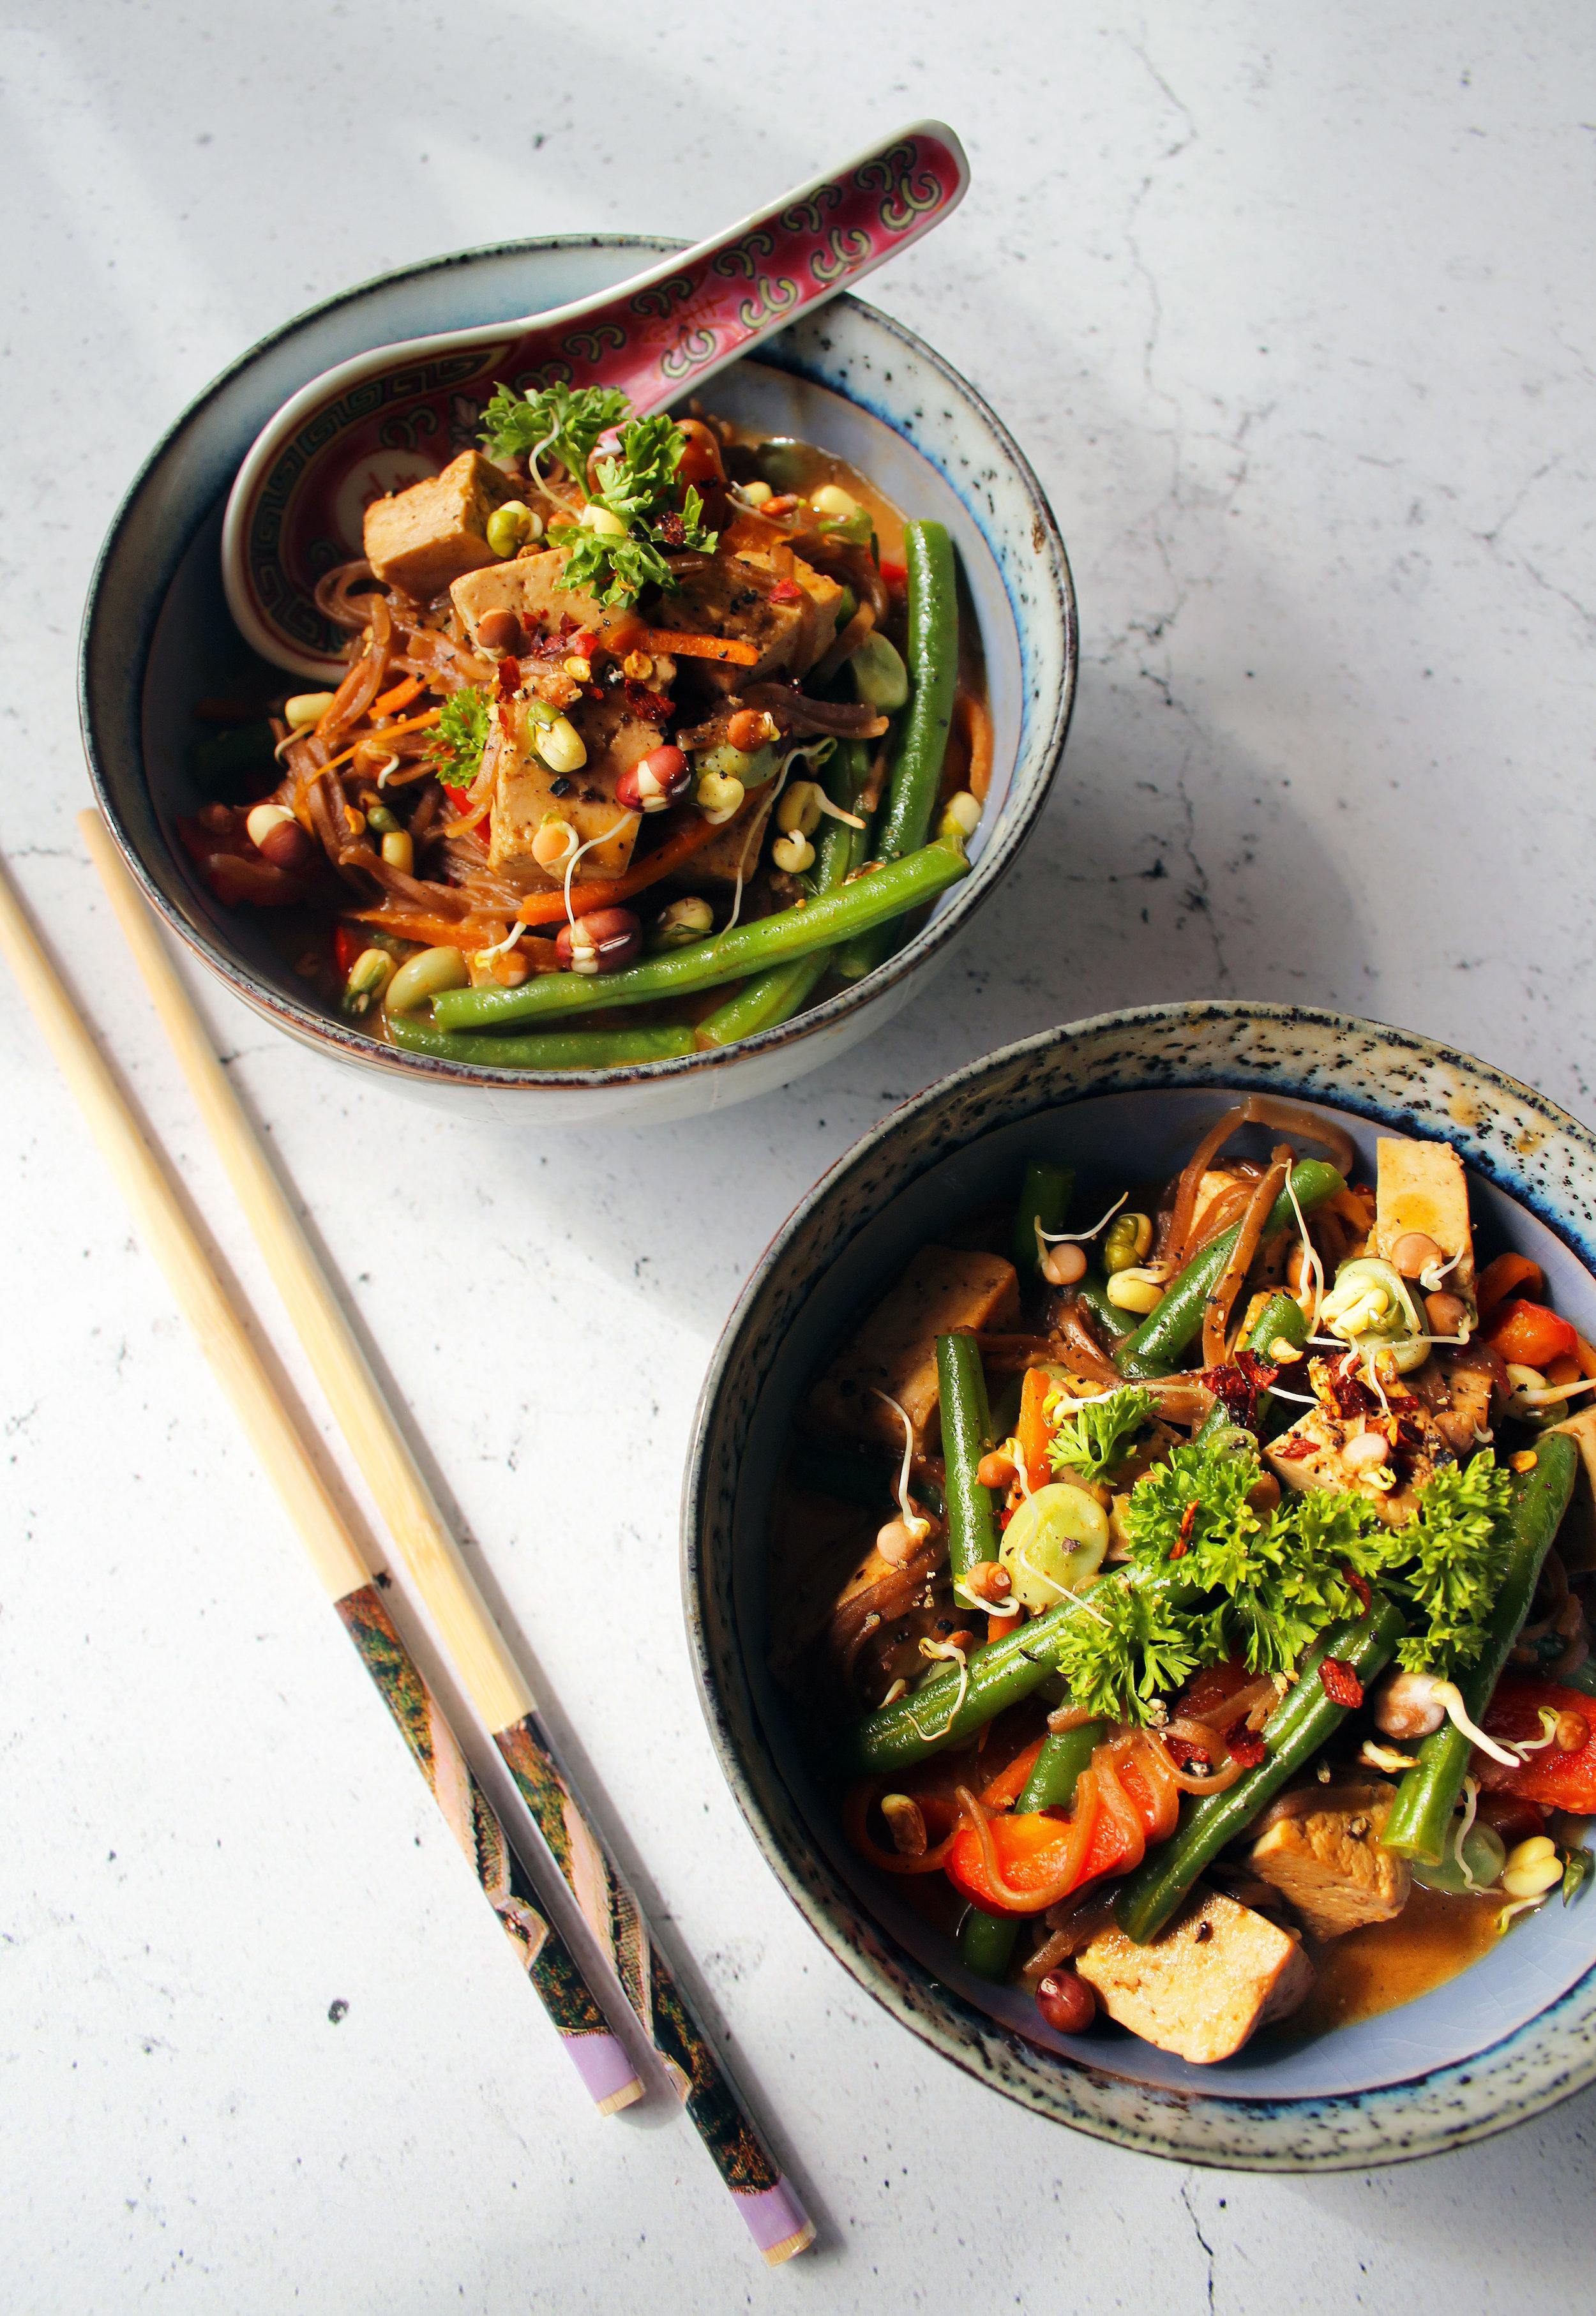 Spicy tofu recipe | The Flourishing Pantry